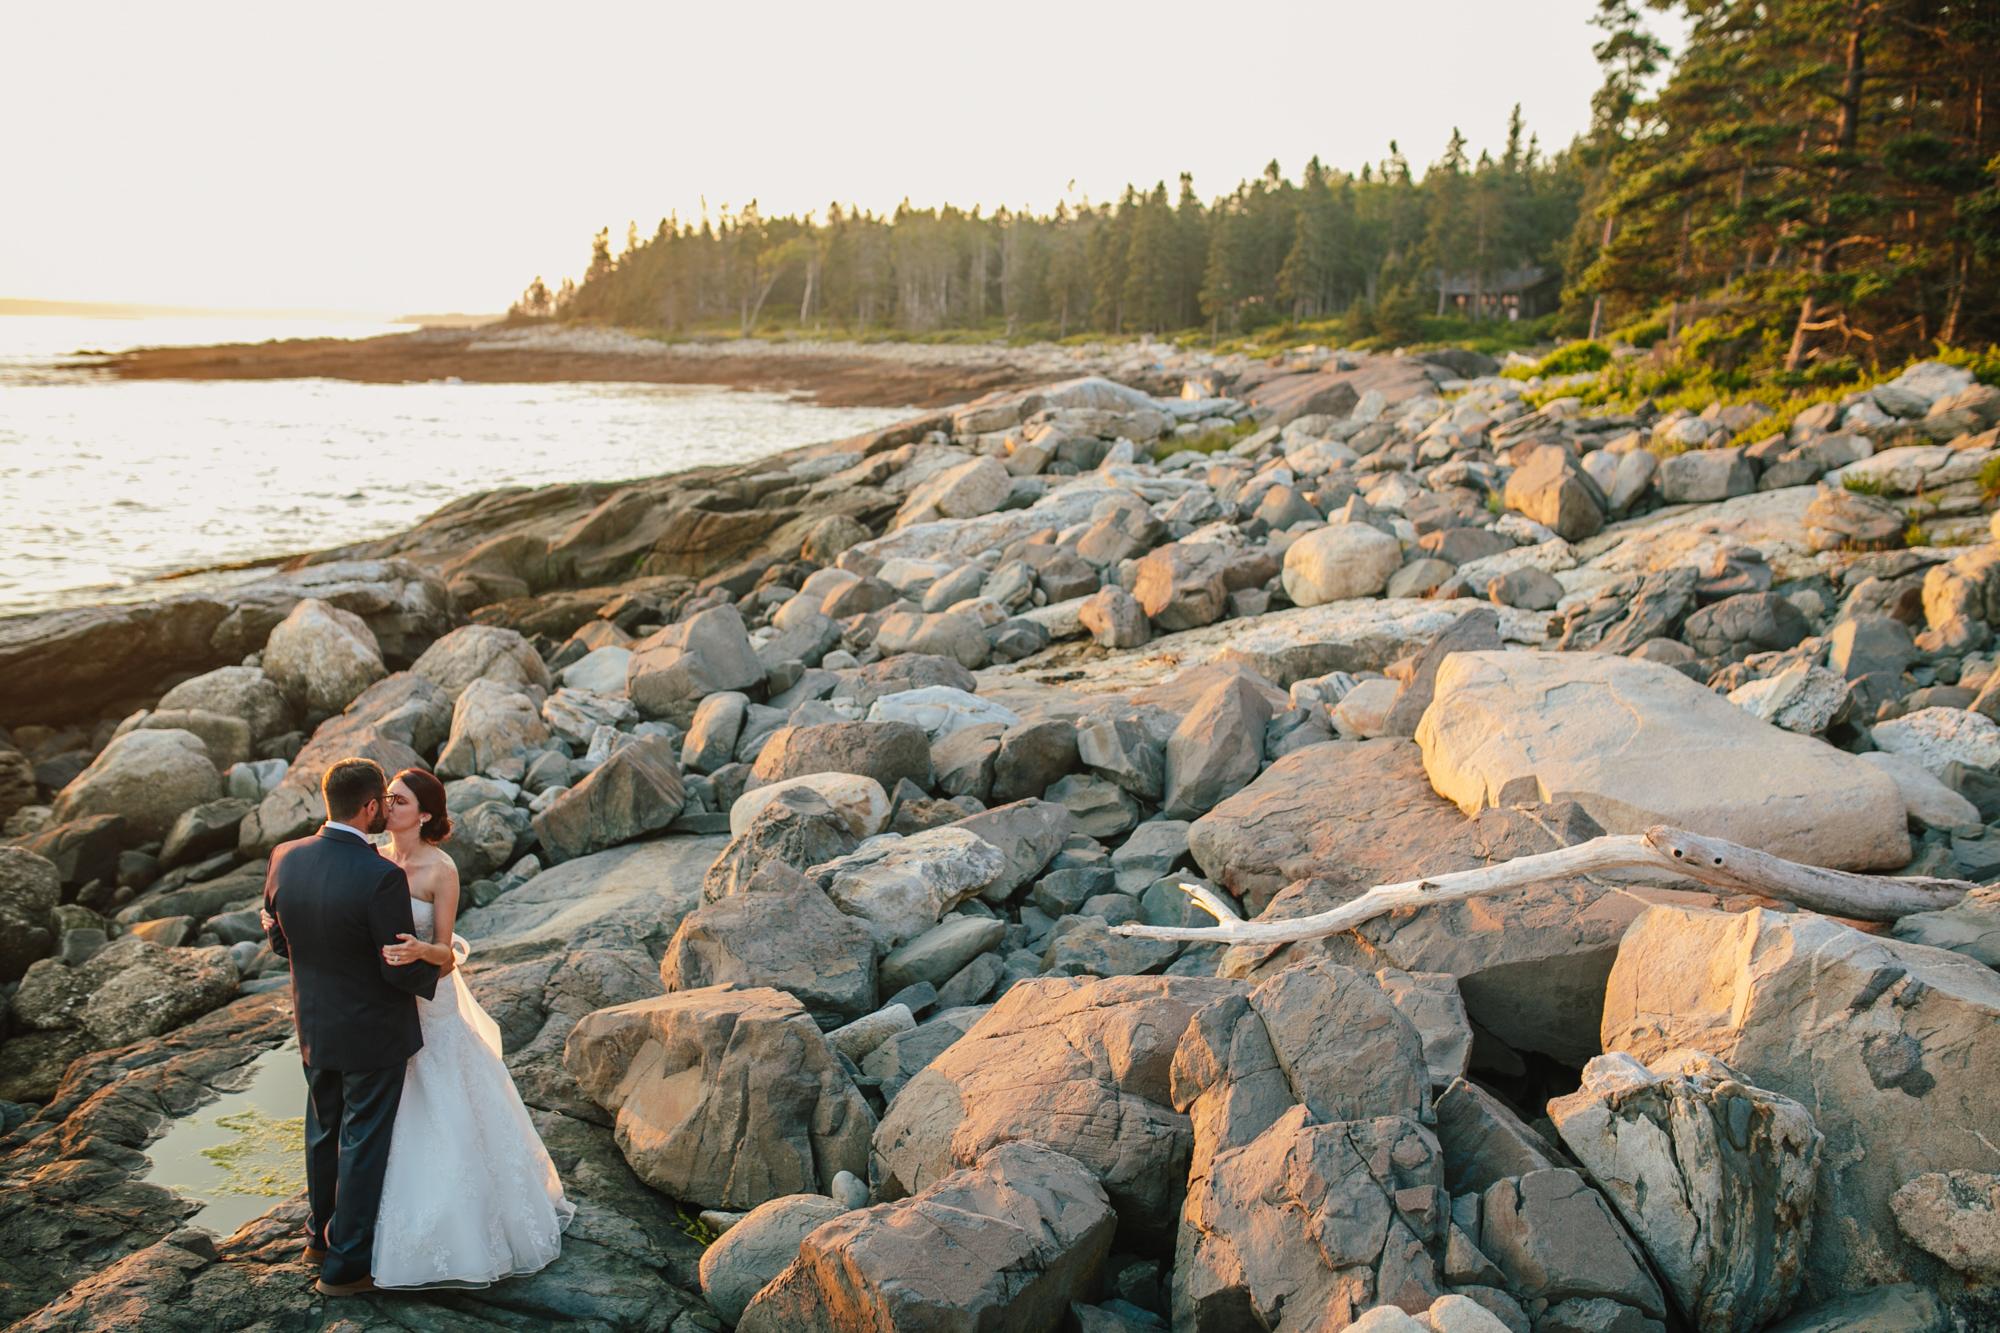 Booth-Bay-Harbor-Maine-Wedding-Beach-Tent-Cliffs-Ocean-New-England-Wedding-Photography-Emily-Tebbetts-22.jpg